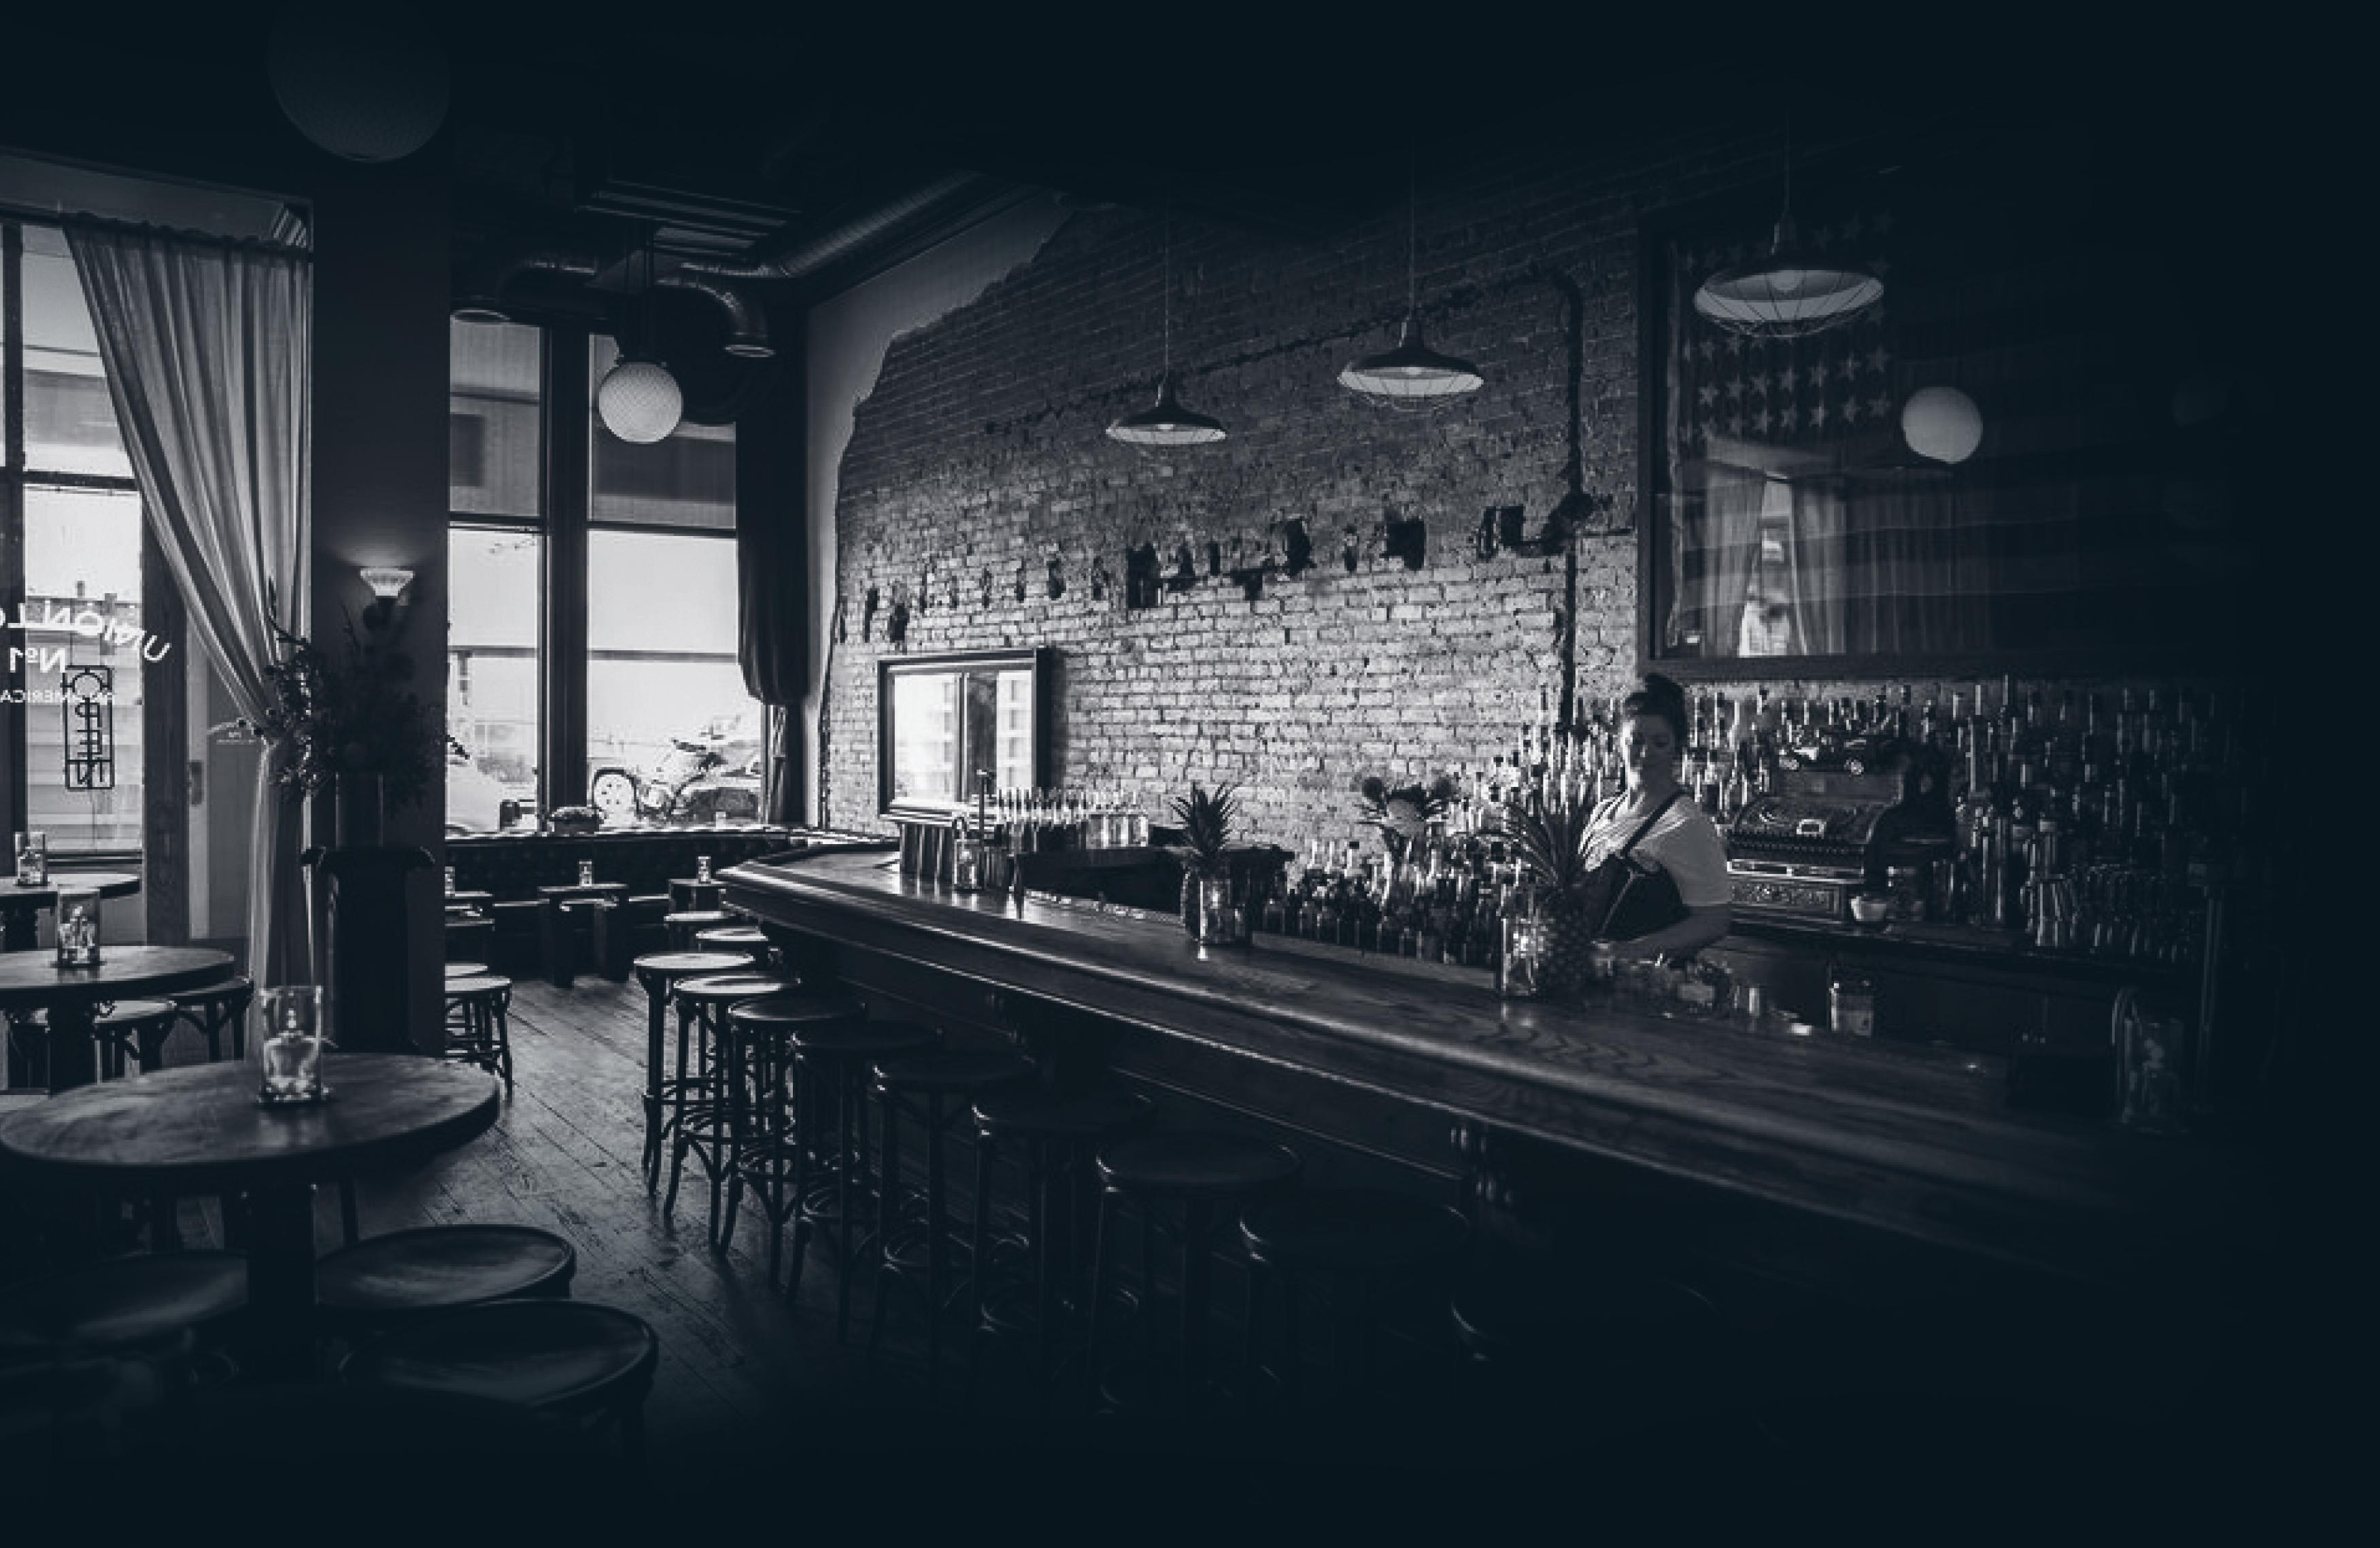 Union Lodge, An American Bar